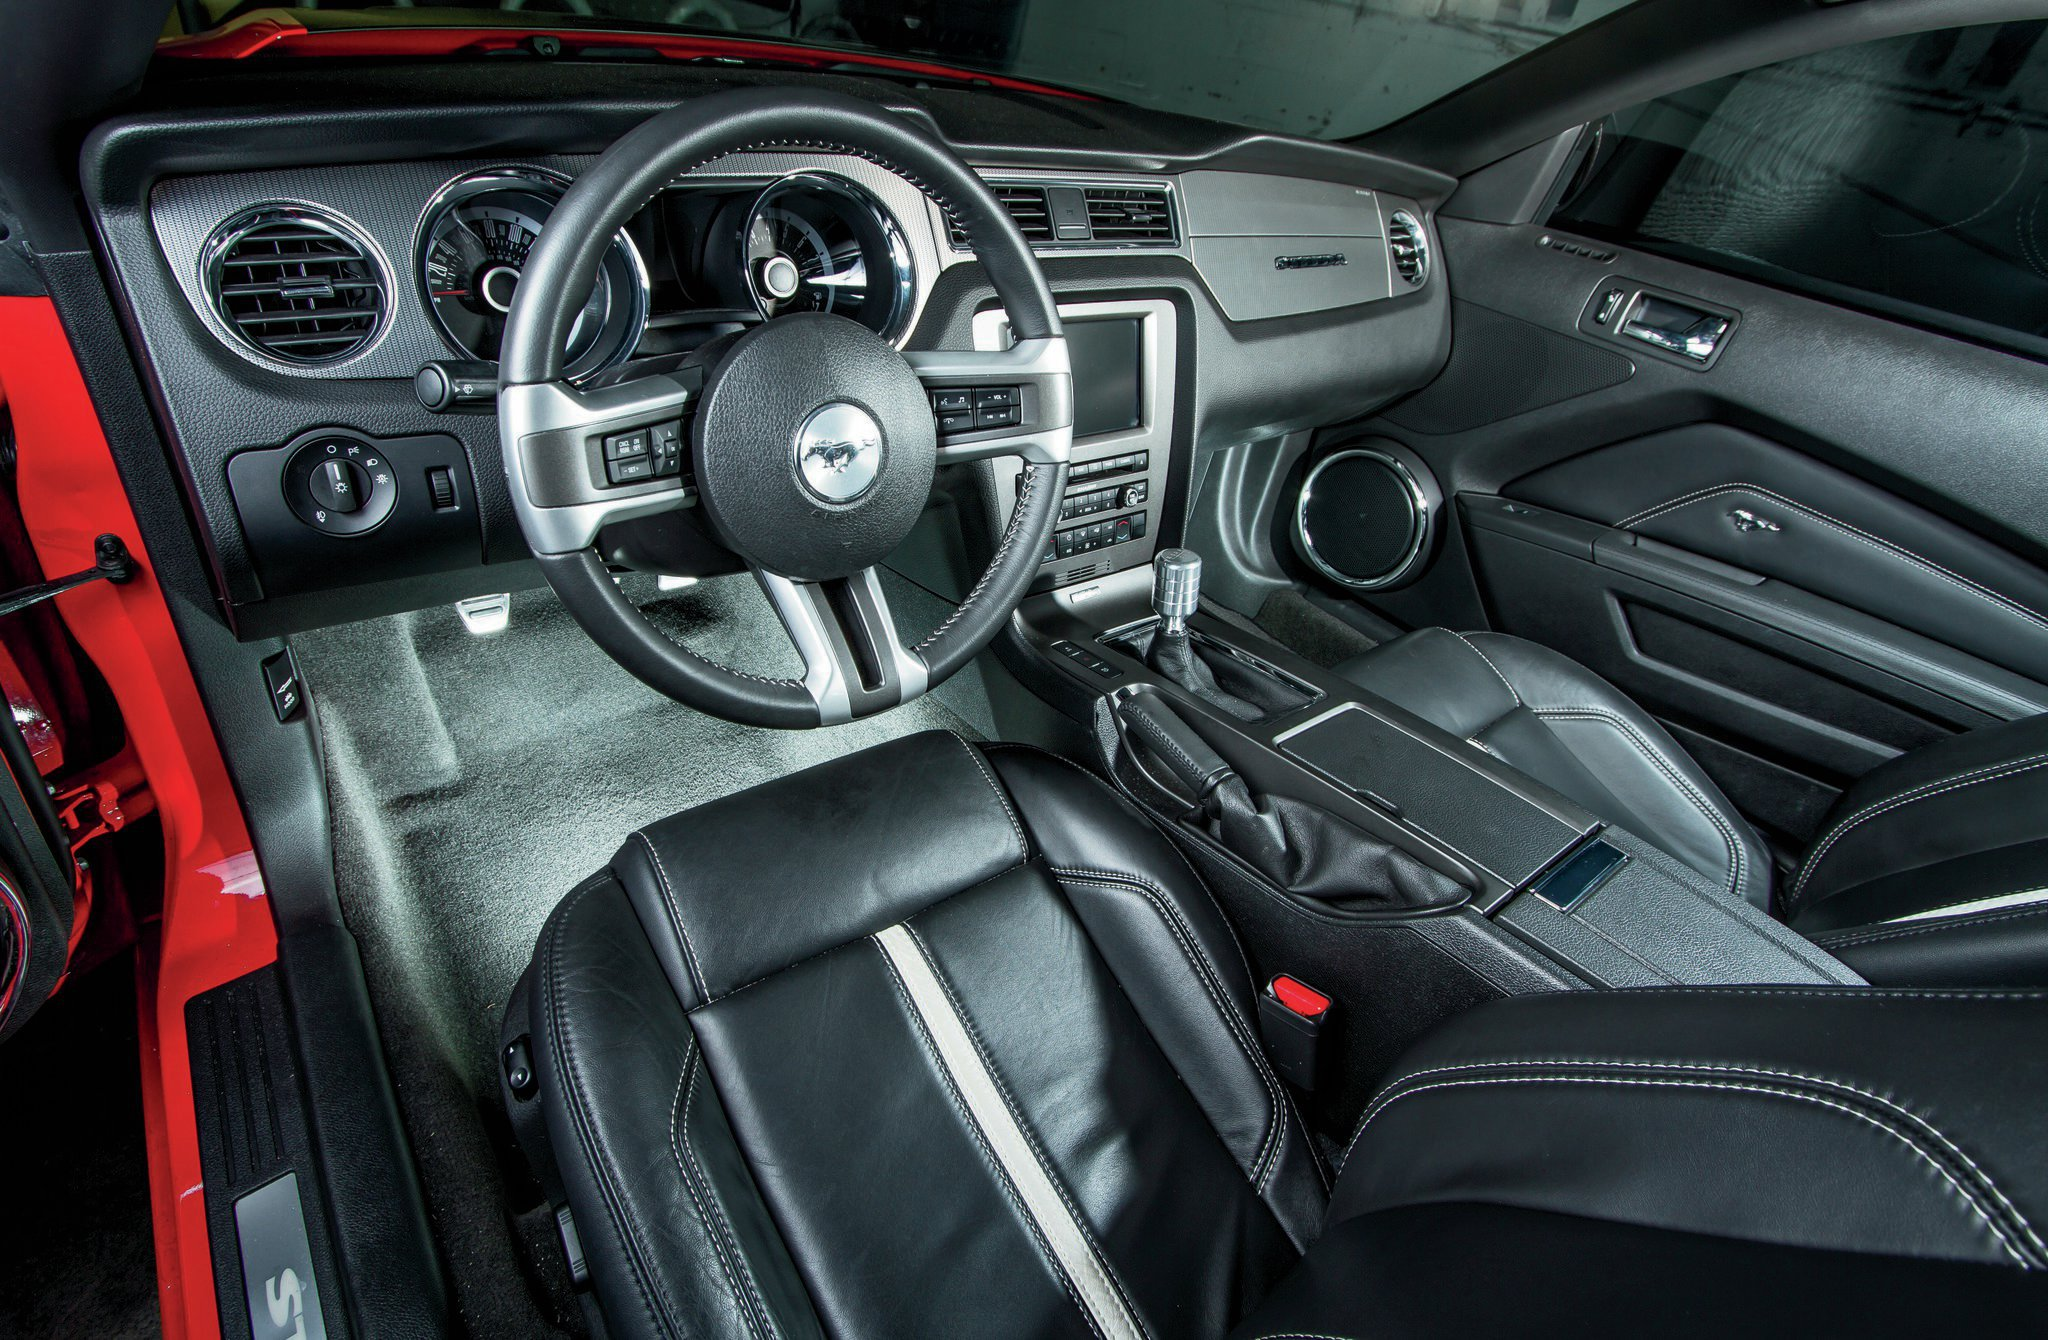 2014 Ford Mustang Interior